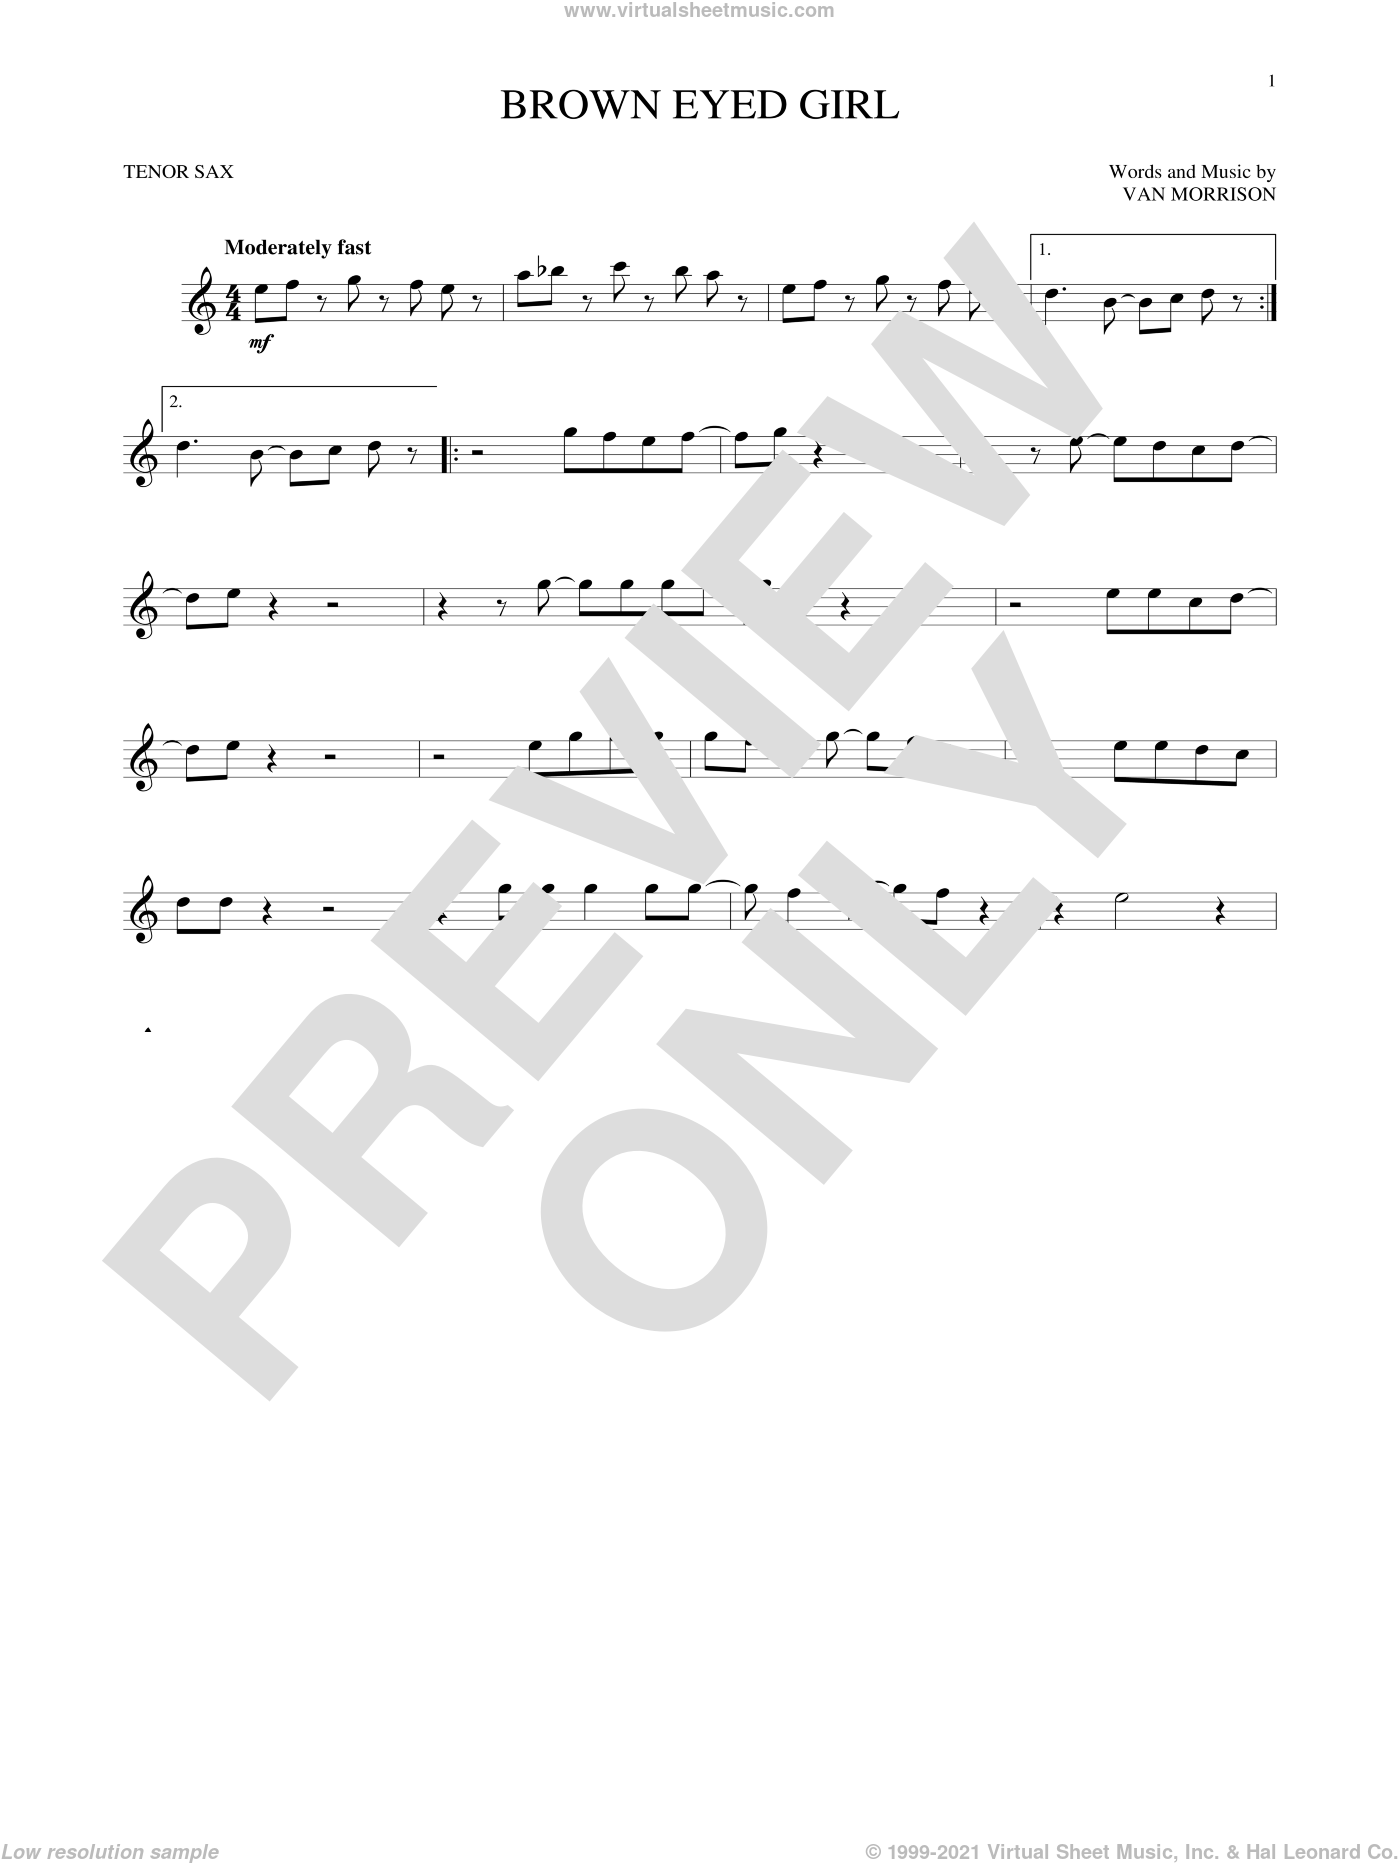 Brown Eyed Girl sheet music for tenor saxophone solo by Van Morrison, intermediate skill level